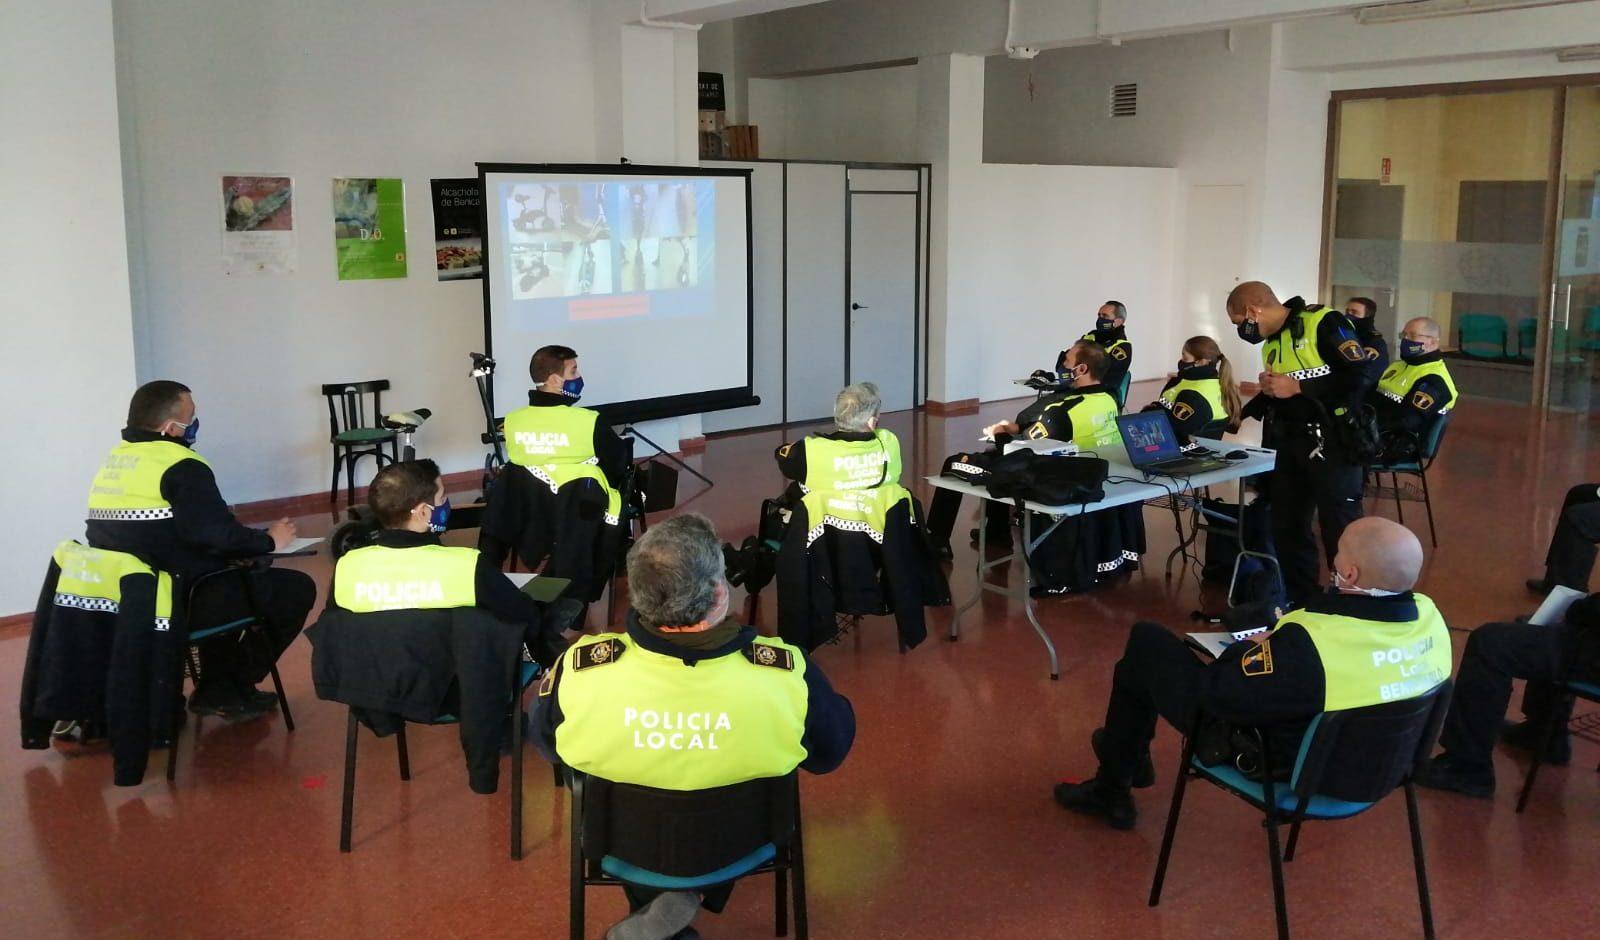 La Policia Local de Benicarló rep formació sobre la normativa de circulació relativa alsVMP